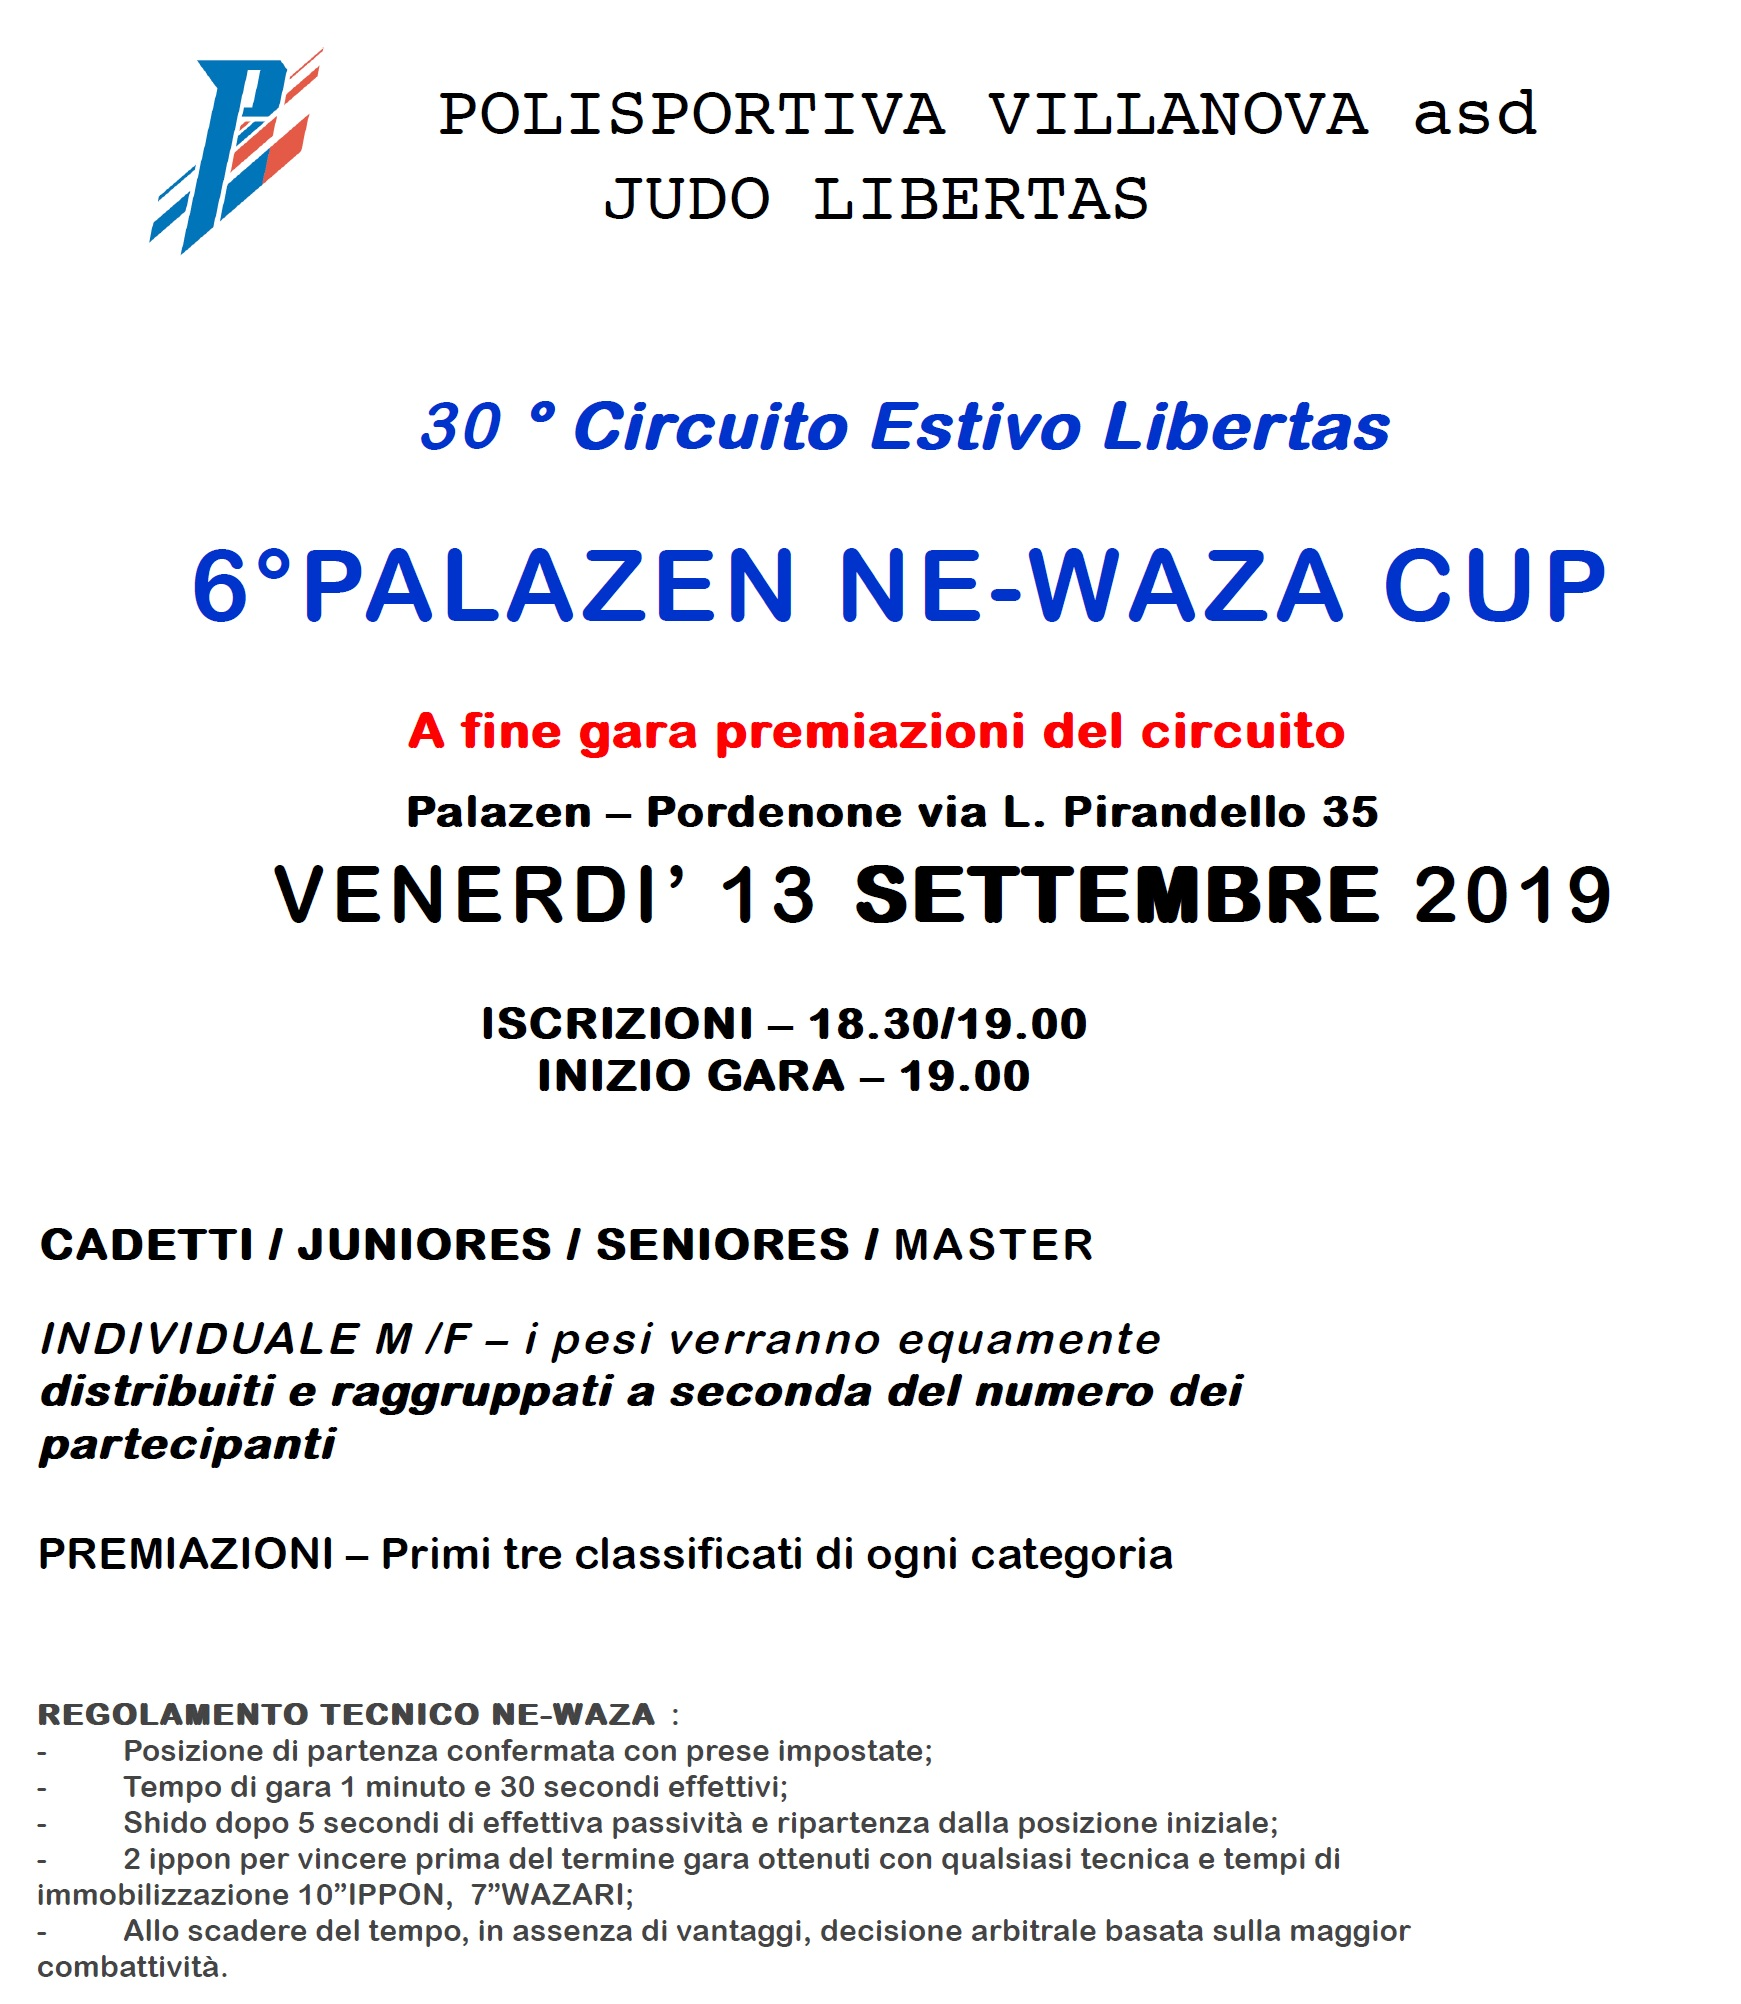 6a Ne-waza Cup